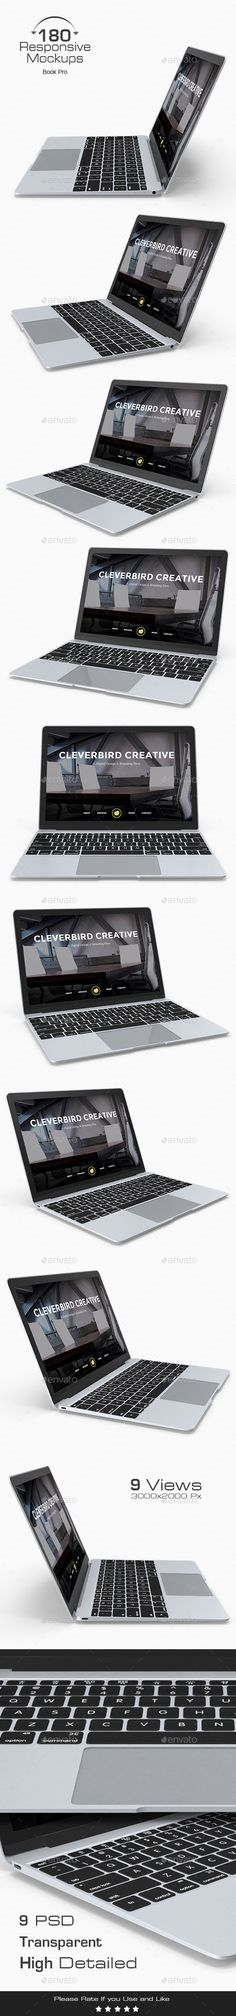 180 Responsive 3D Mockup - Mac Book Pro. Download here: http://graphicriver.net/item/180-responsive-3d-mockup-mac-book-pro-/16607941?ref=ksioks